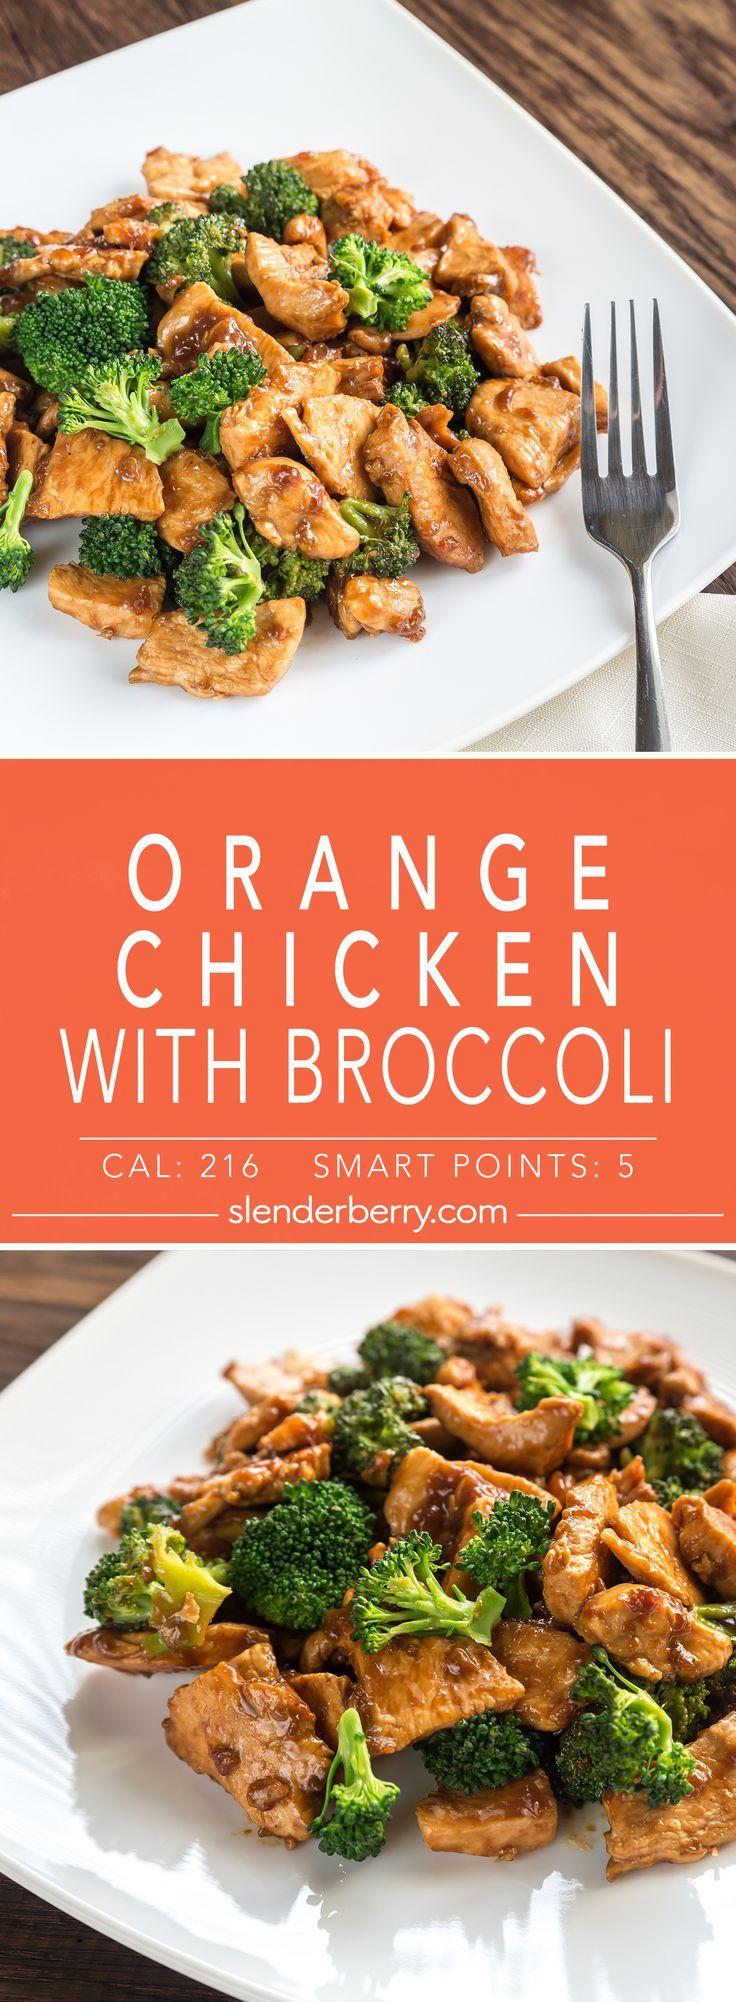 Orange Chicken with Broccoli - Slenderberry